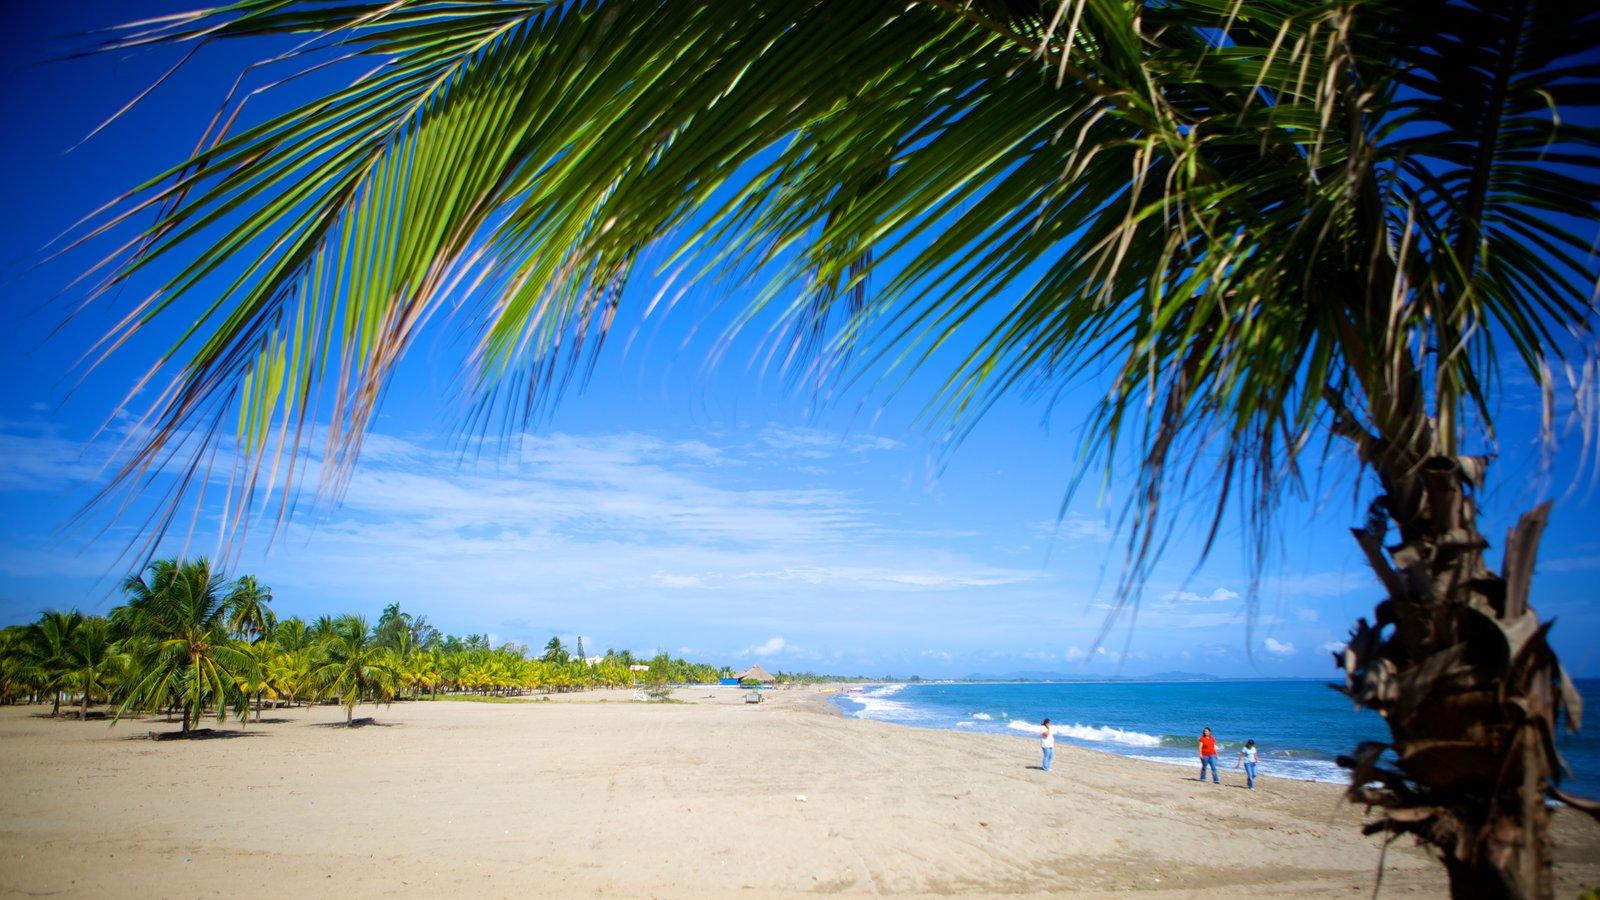 Tela Honduras All Inclusive Vacation Deals Sunwing Ca